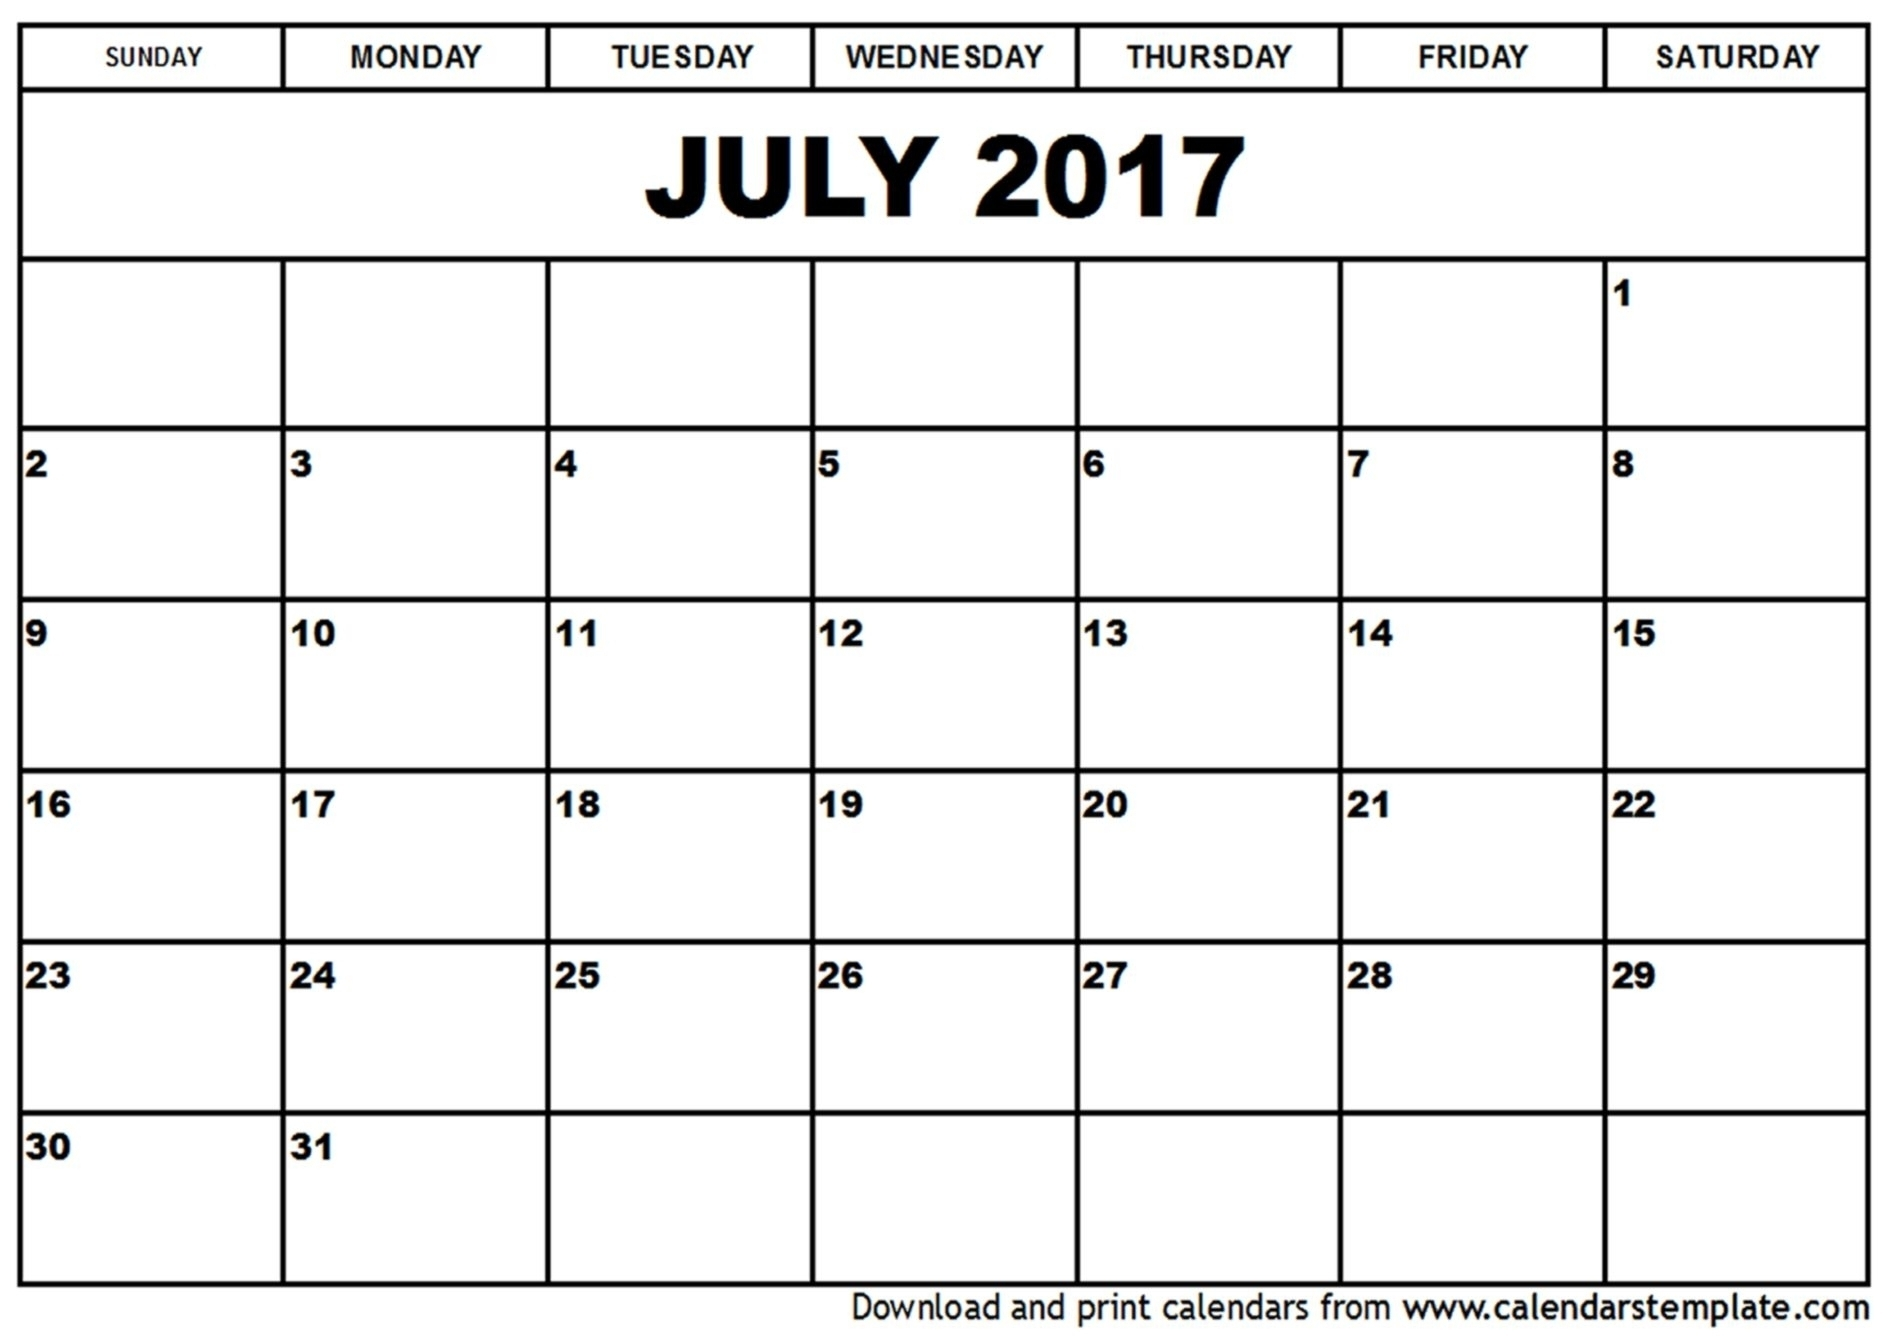 Military Short Timers Calendar Printable | Calendar Template 2020